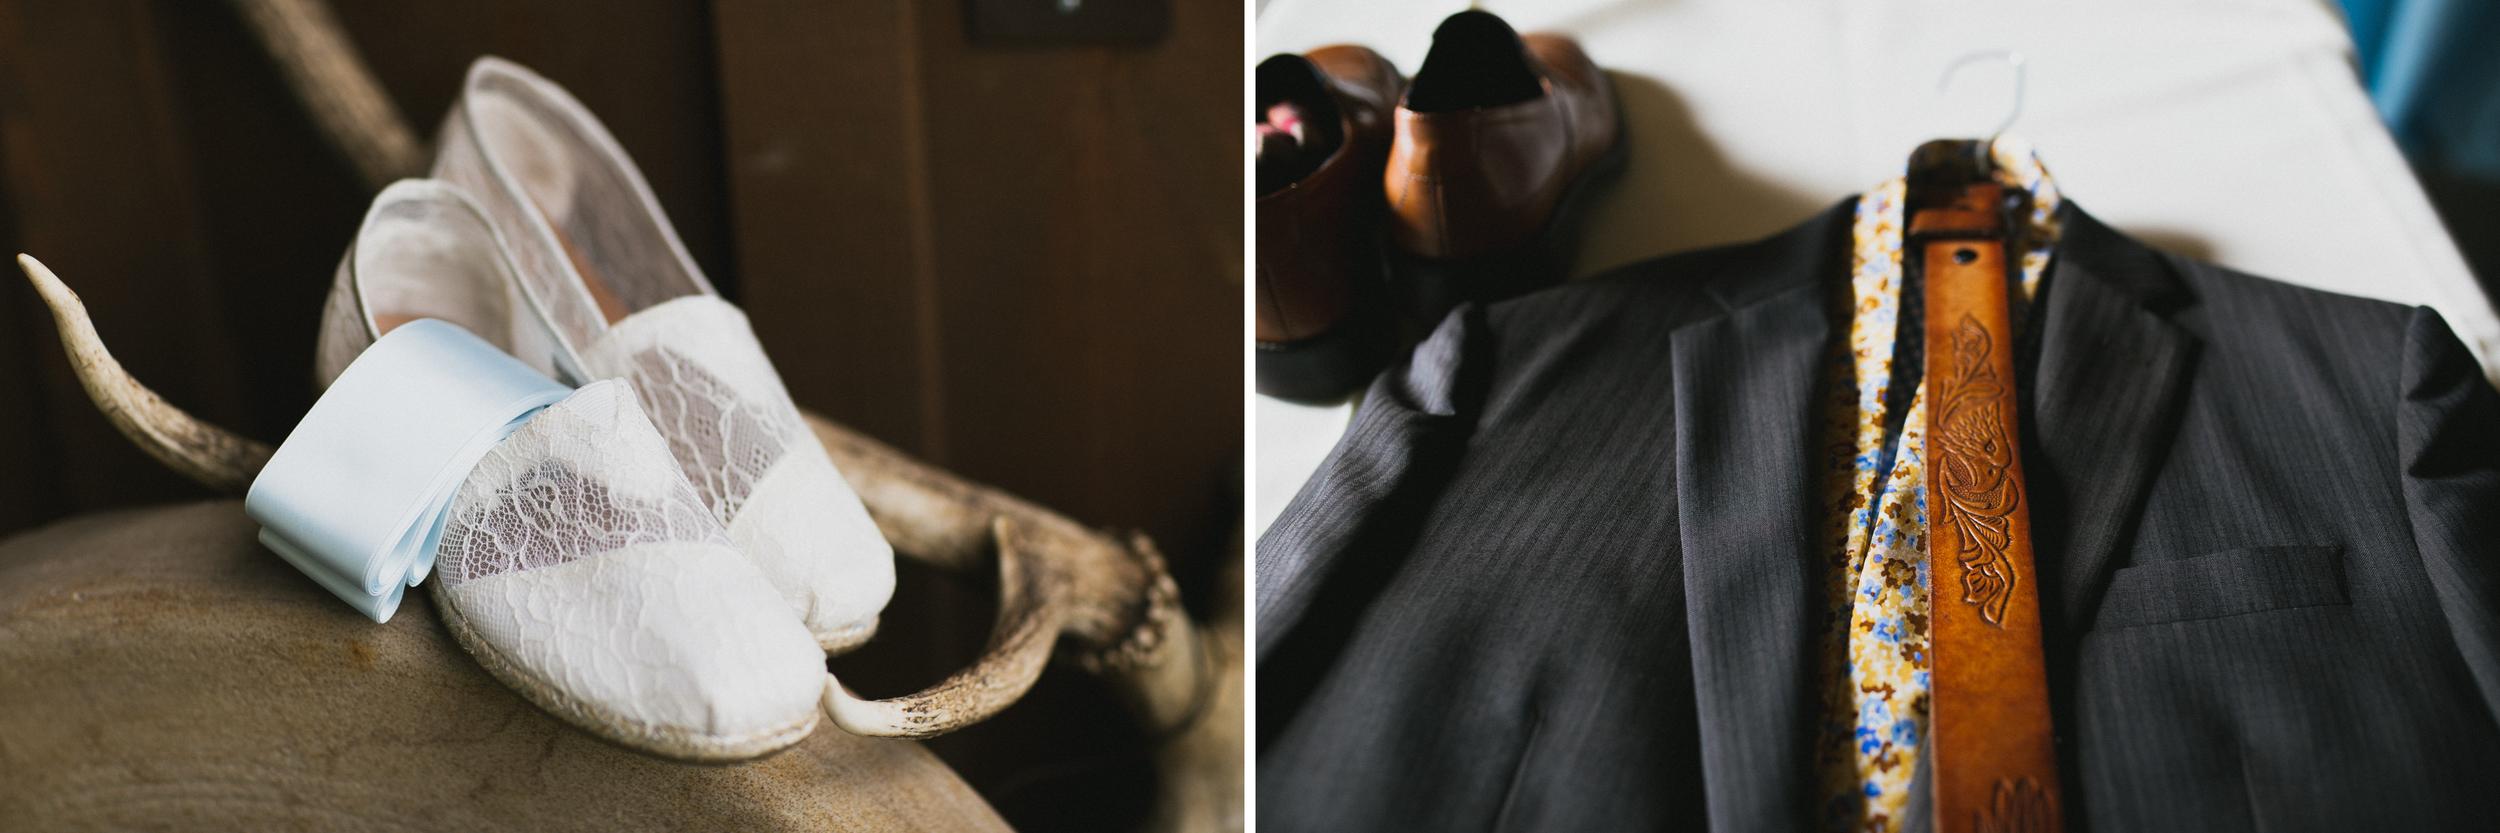 Salt-Lake-City-Wedding-Photographer-Utah-02.jpg